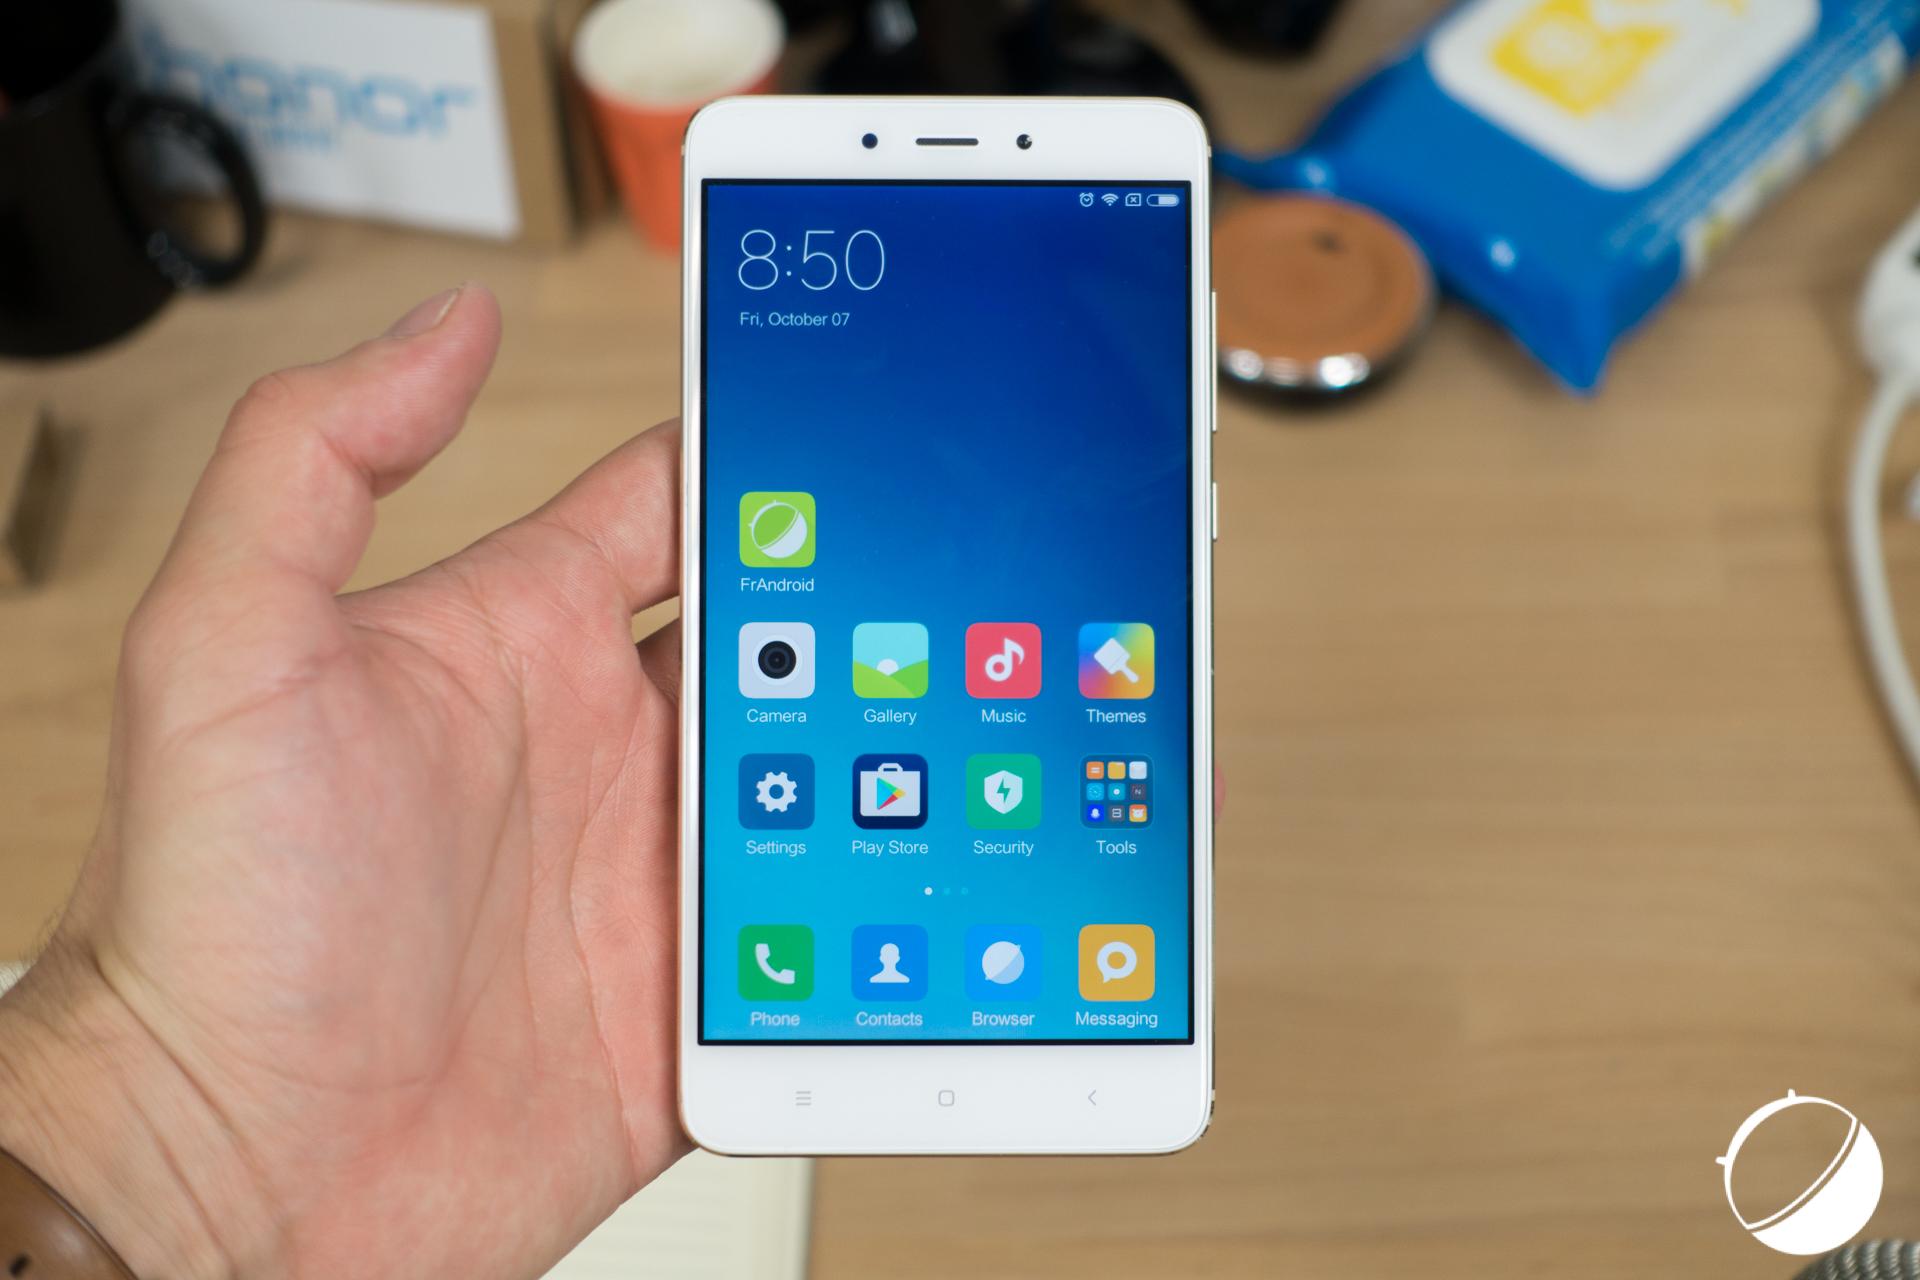 Test Xiaomi Redmi Note 4 Notre Avis Complet Smartphones Frandroid 4x 64 2 Sur 8